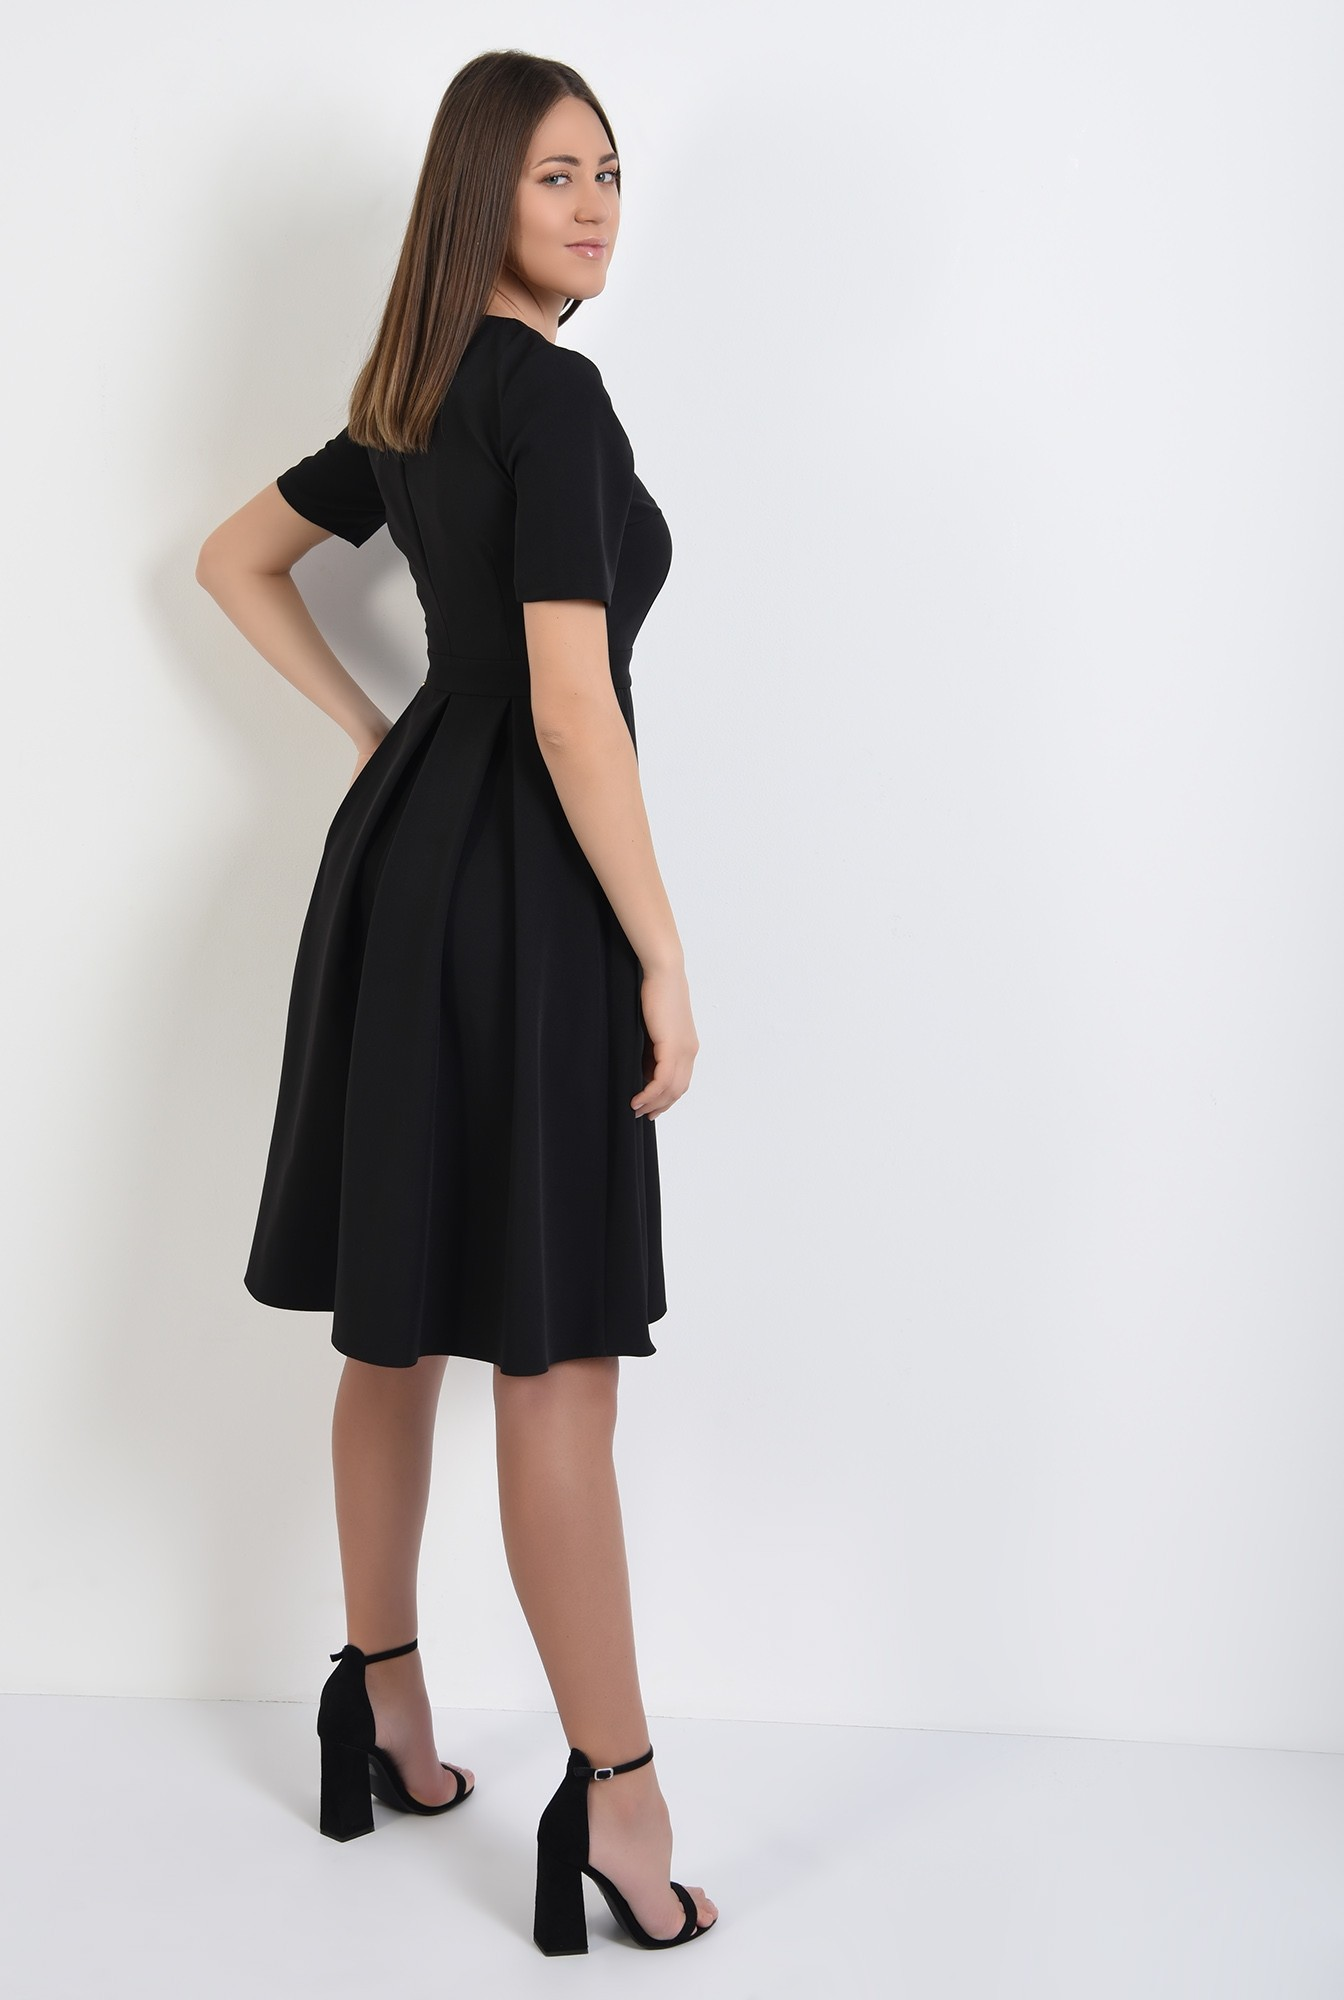 1 - rochie neagra, office, midi, evazata, cu fermoar metalic